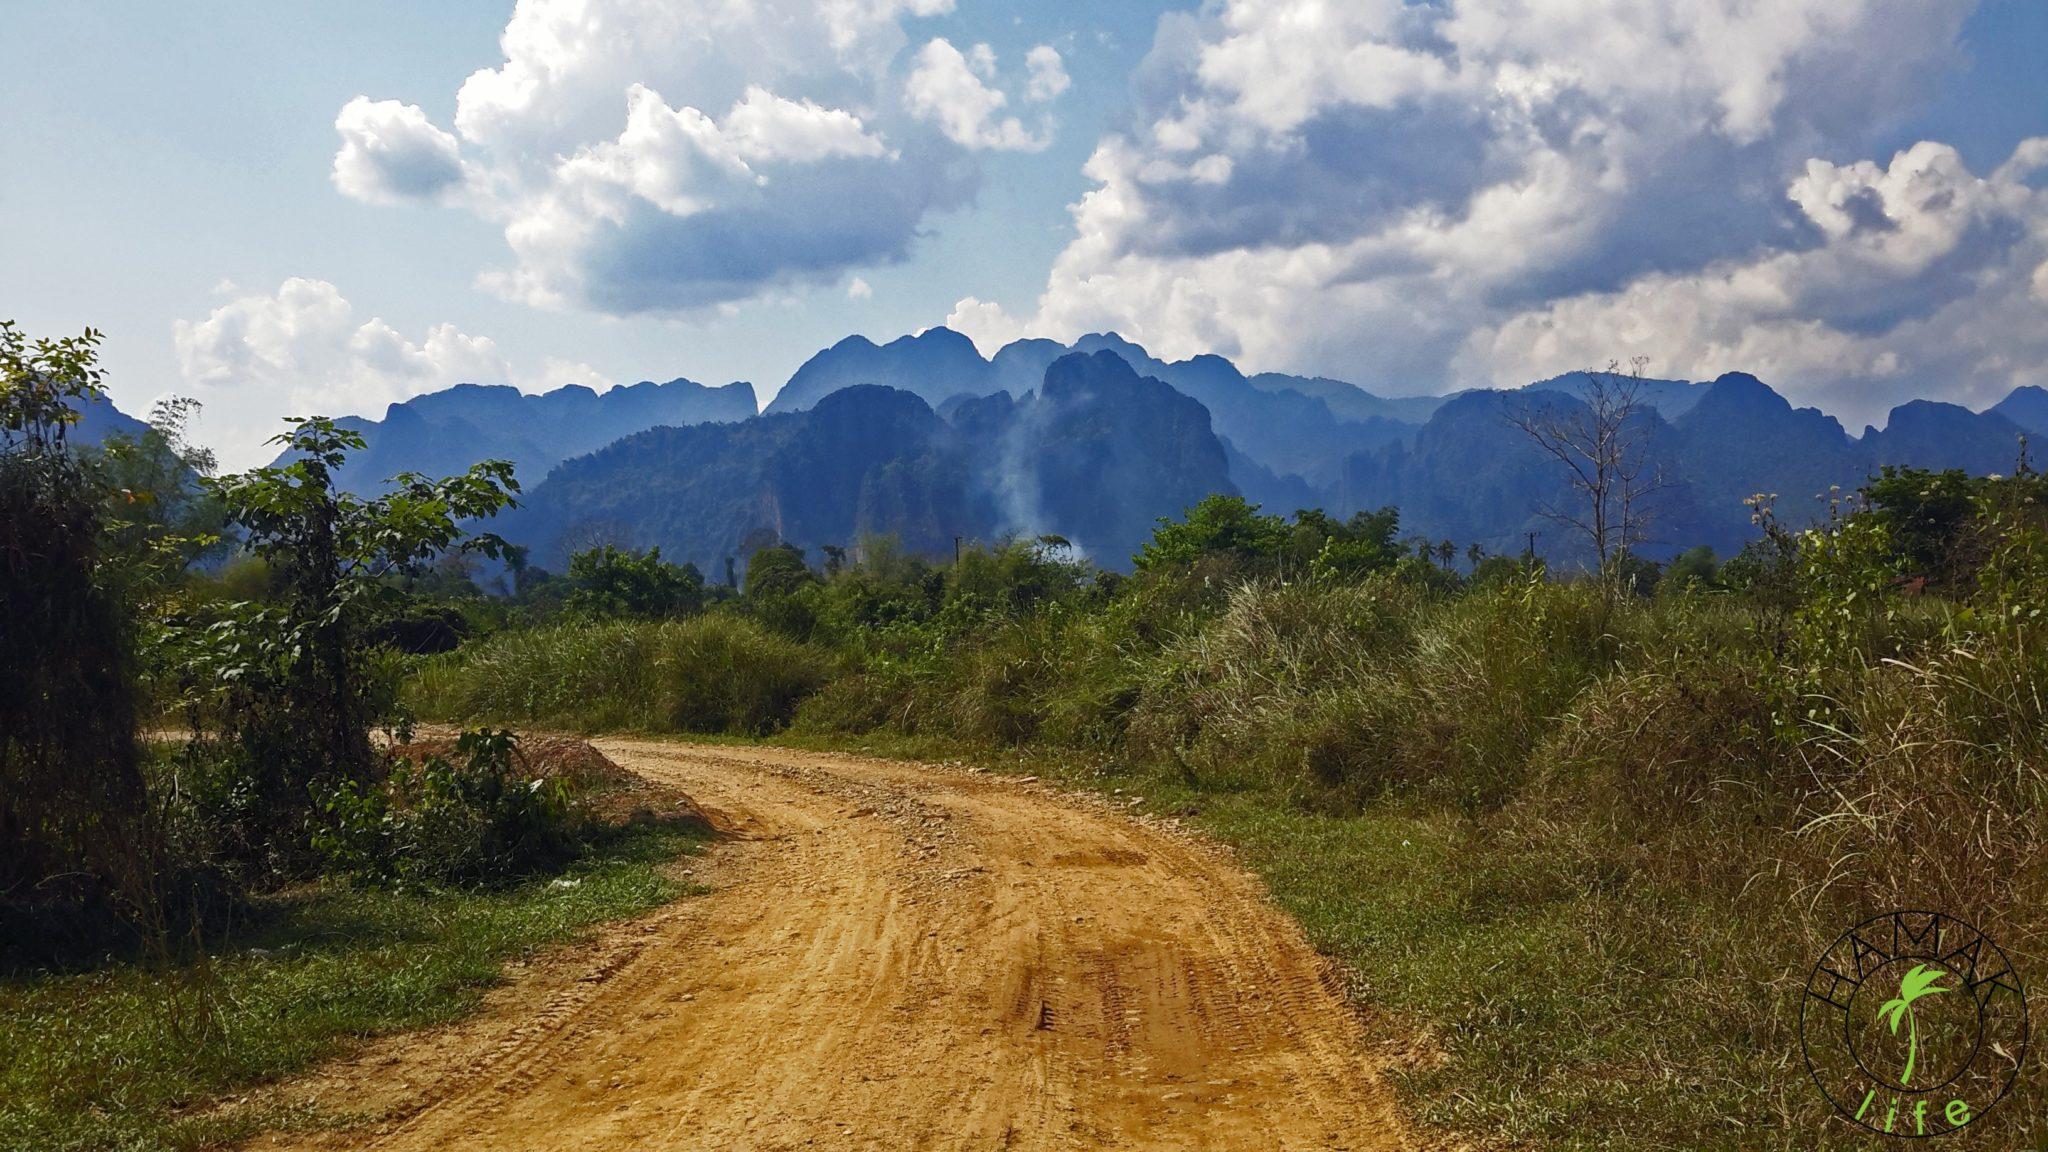 Drogi w Laosie w okolicach Vang Vieng.